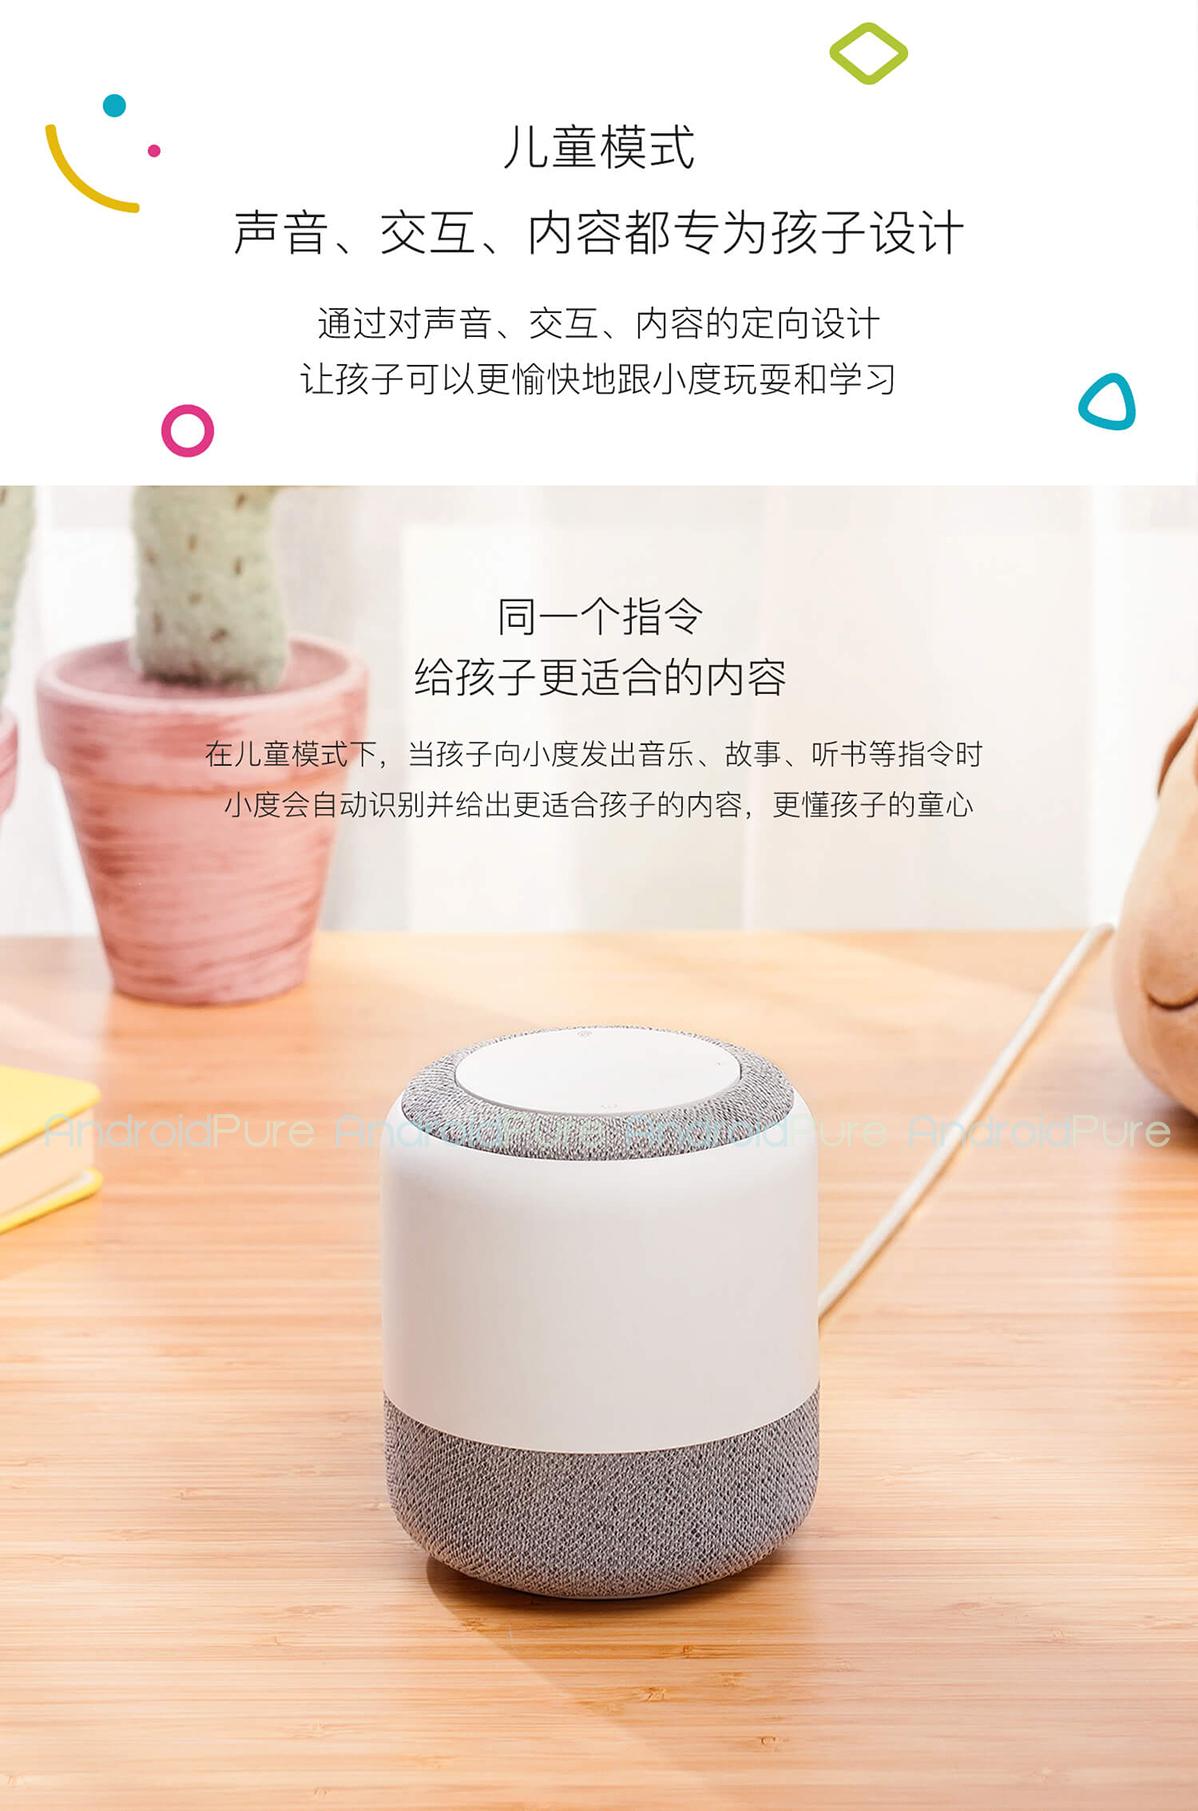 Moto AI Speakers Amazon Echo9 All about Motorola AI Assistant speakers, like Amazon Echo or Google Mini [Updated] 14